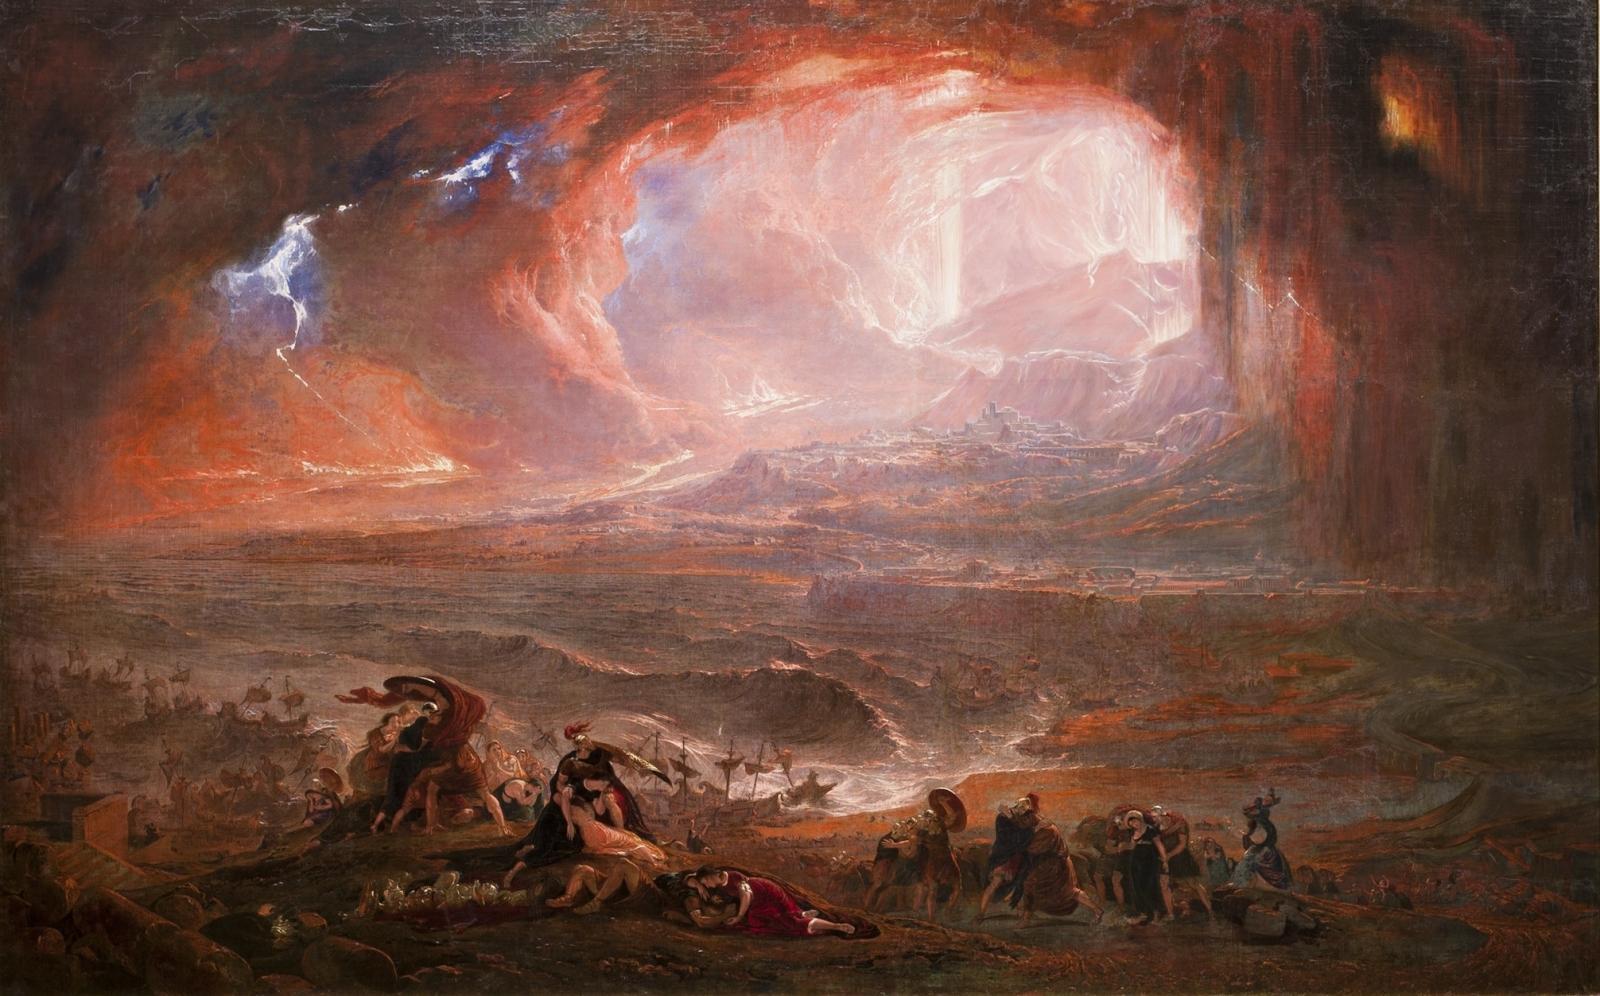 Destruction of Pompeii and Herculaneum